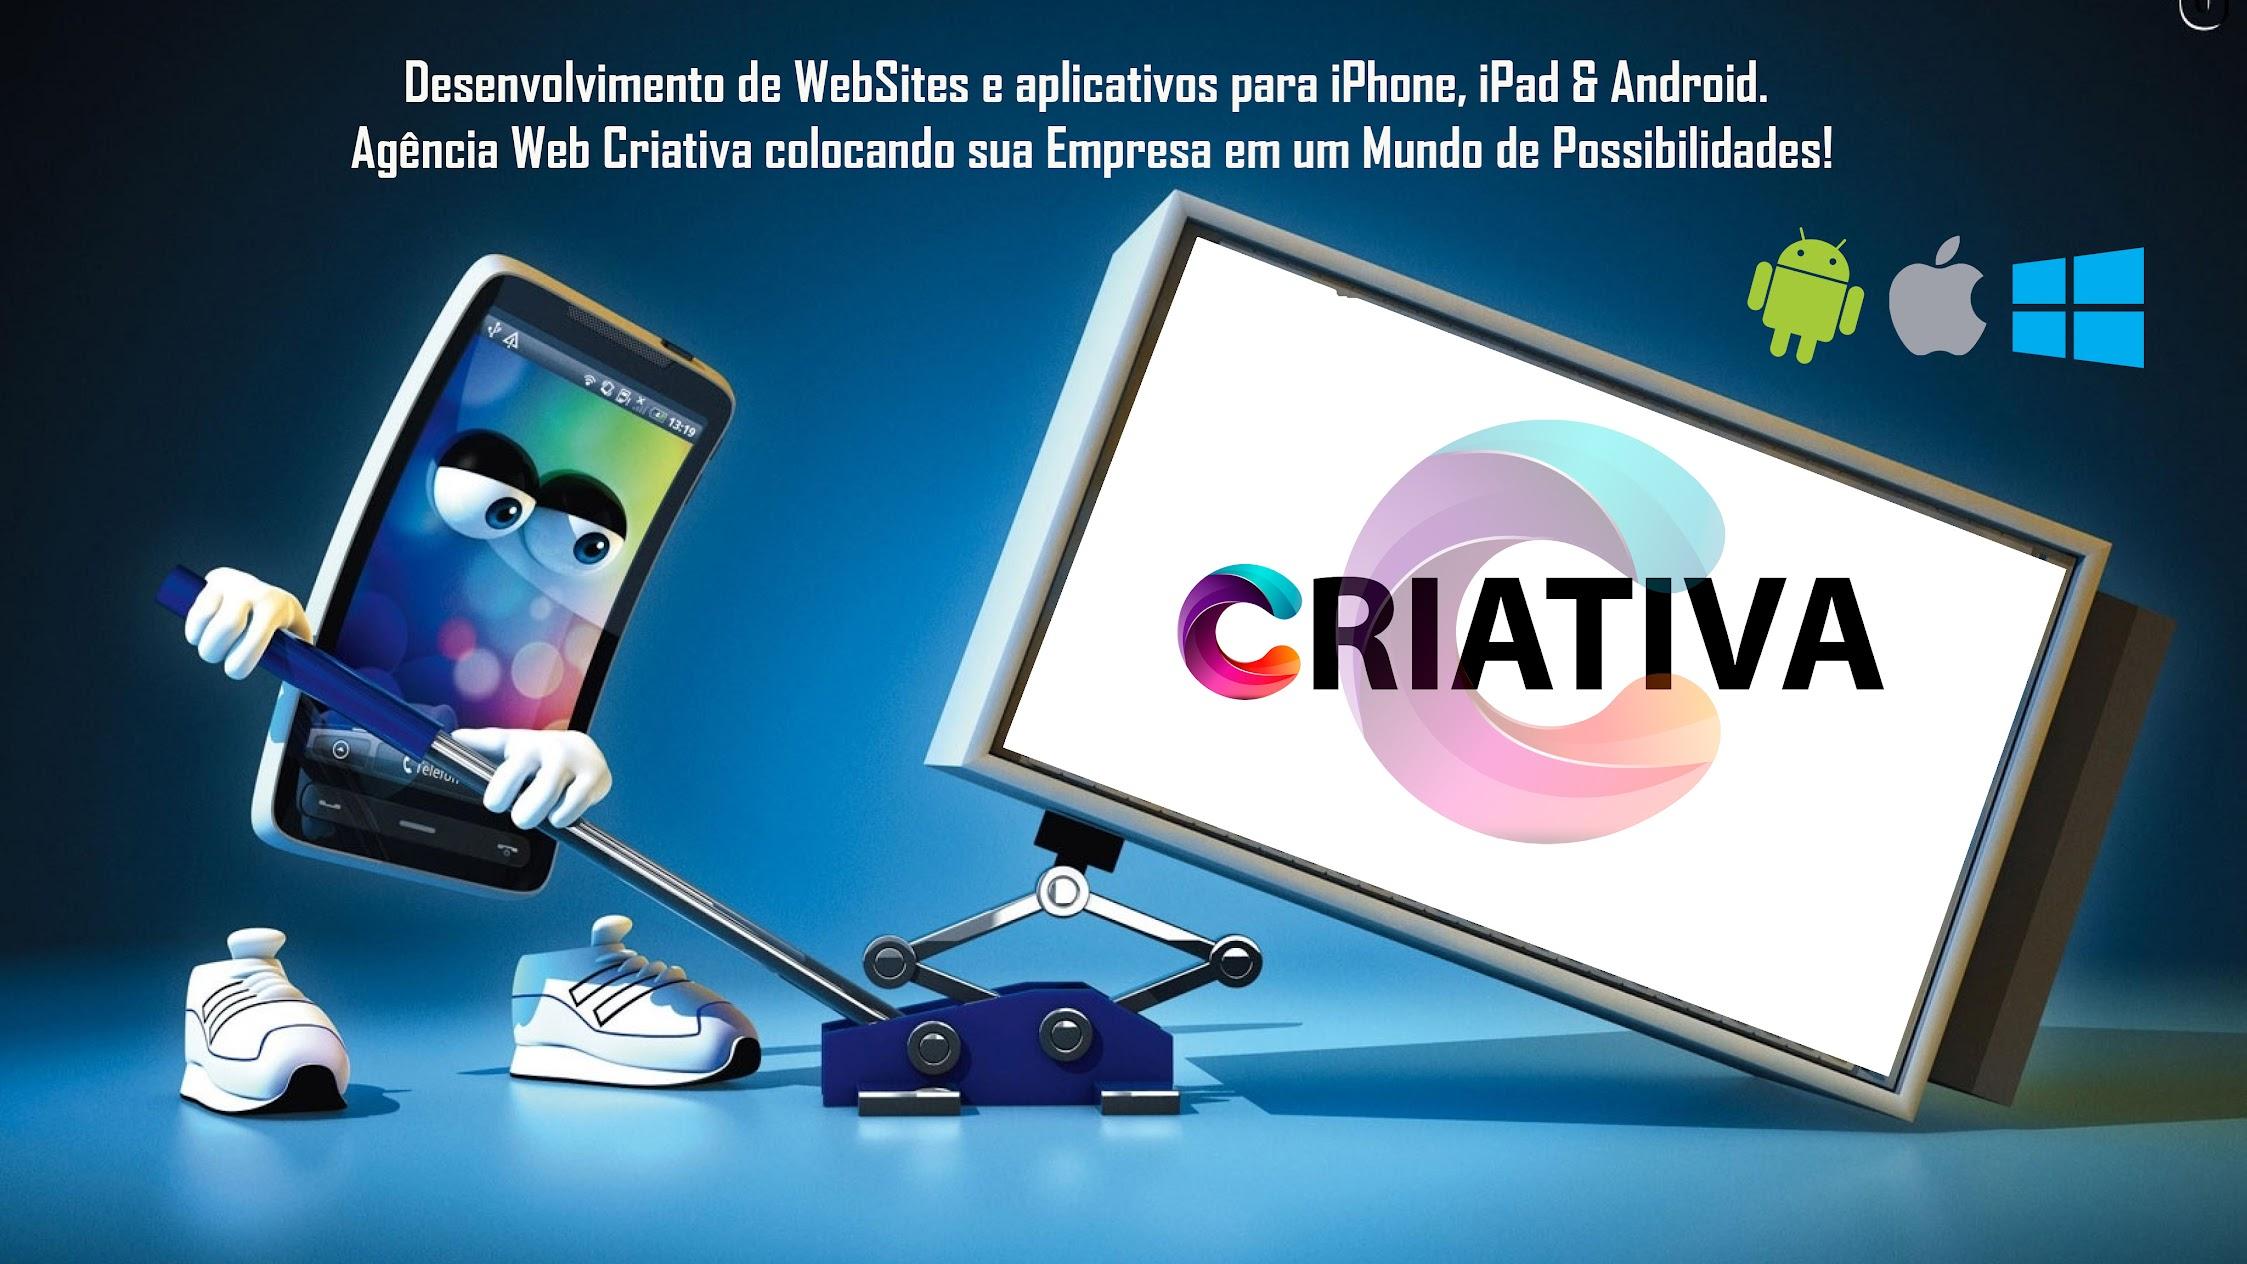 Agência Web Criativa - WebSites & apps